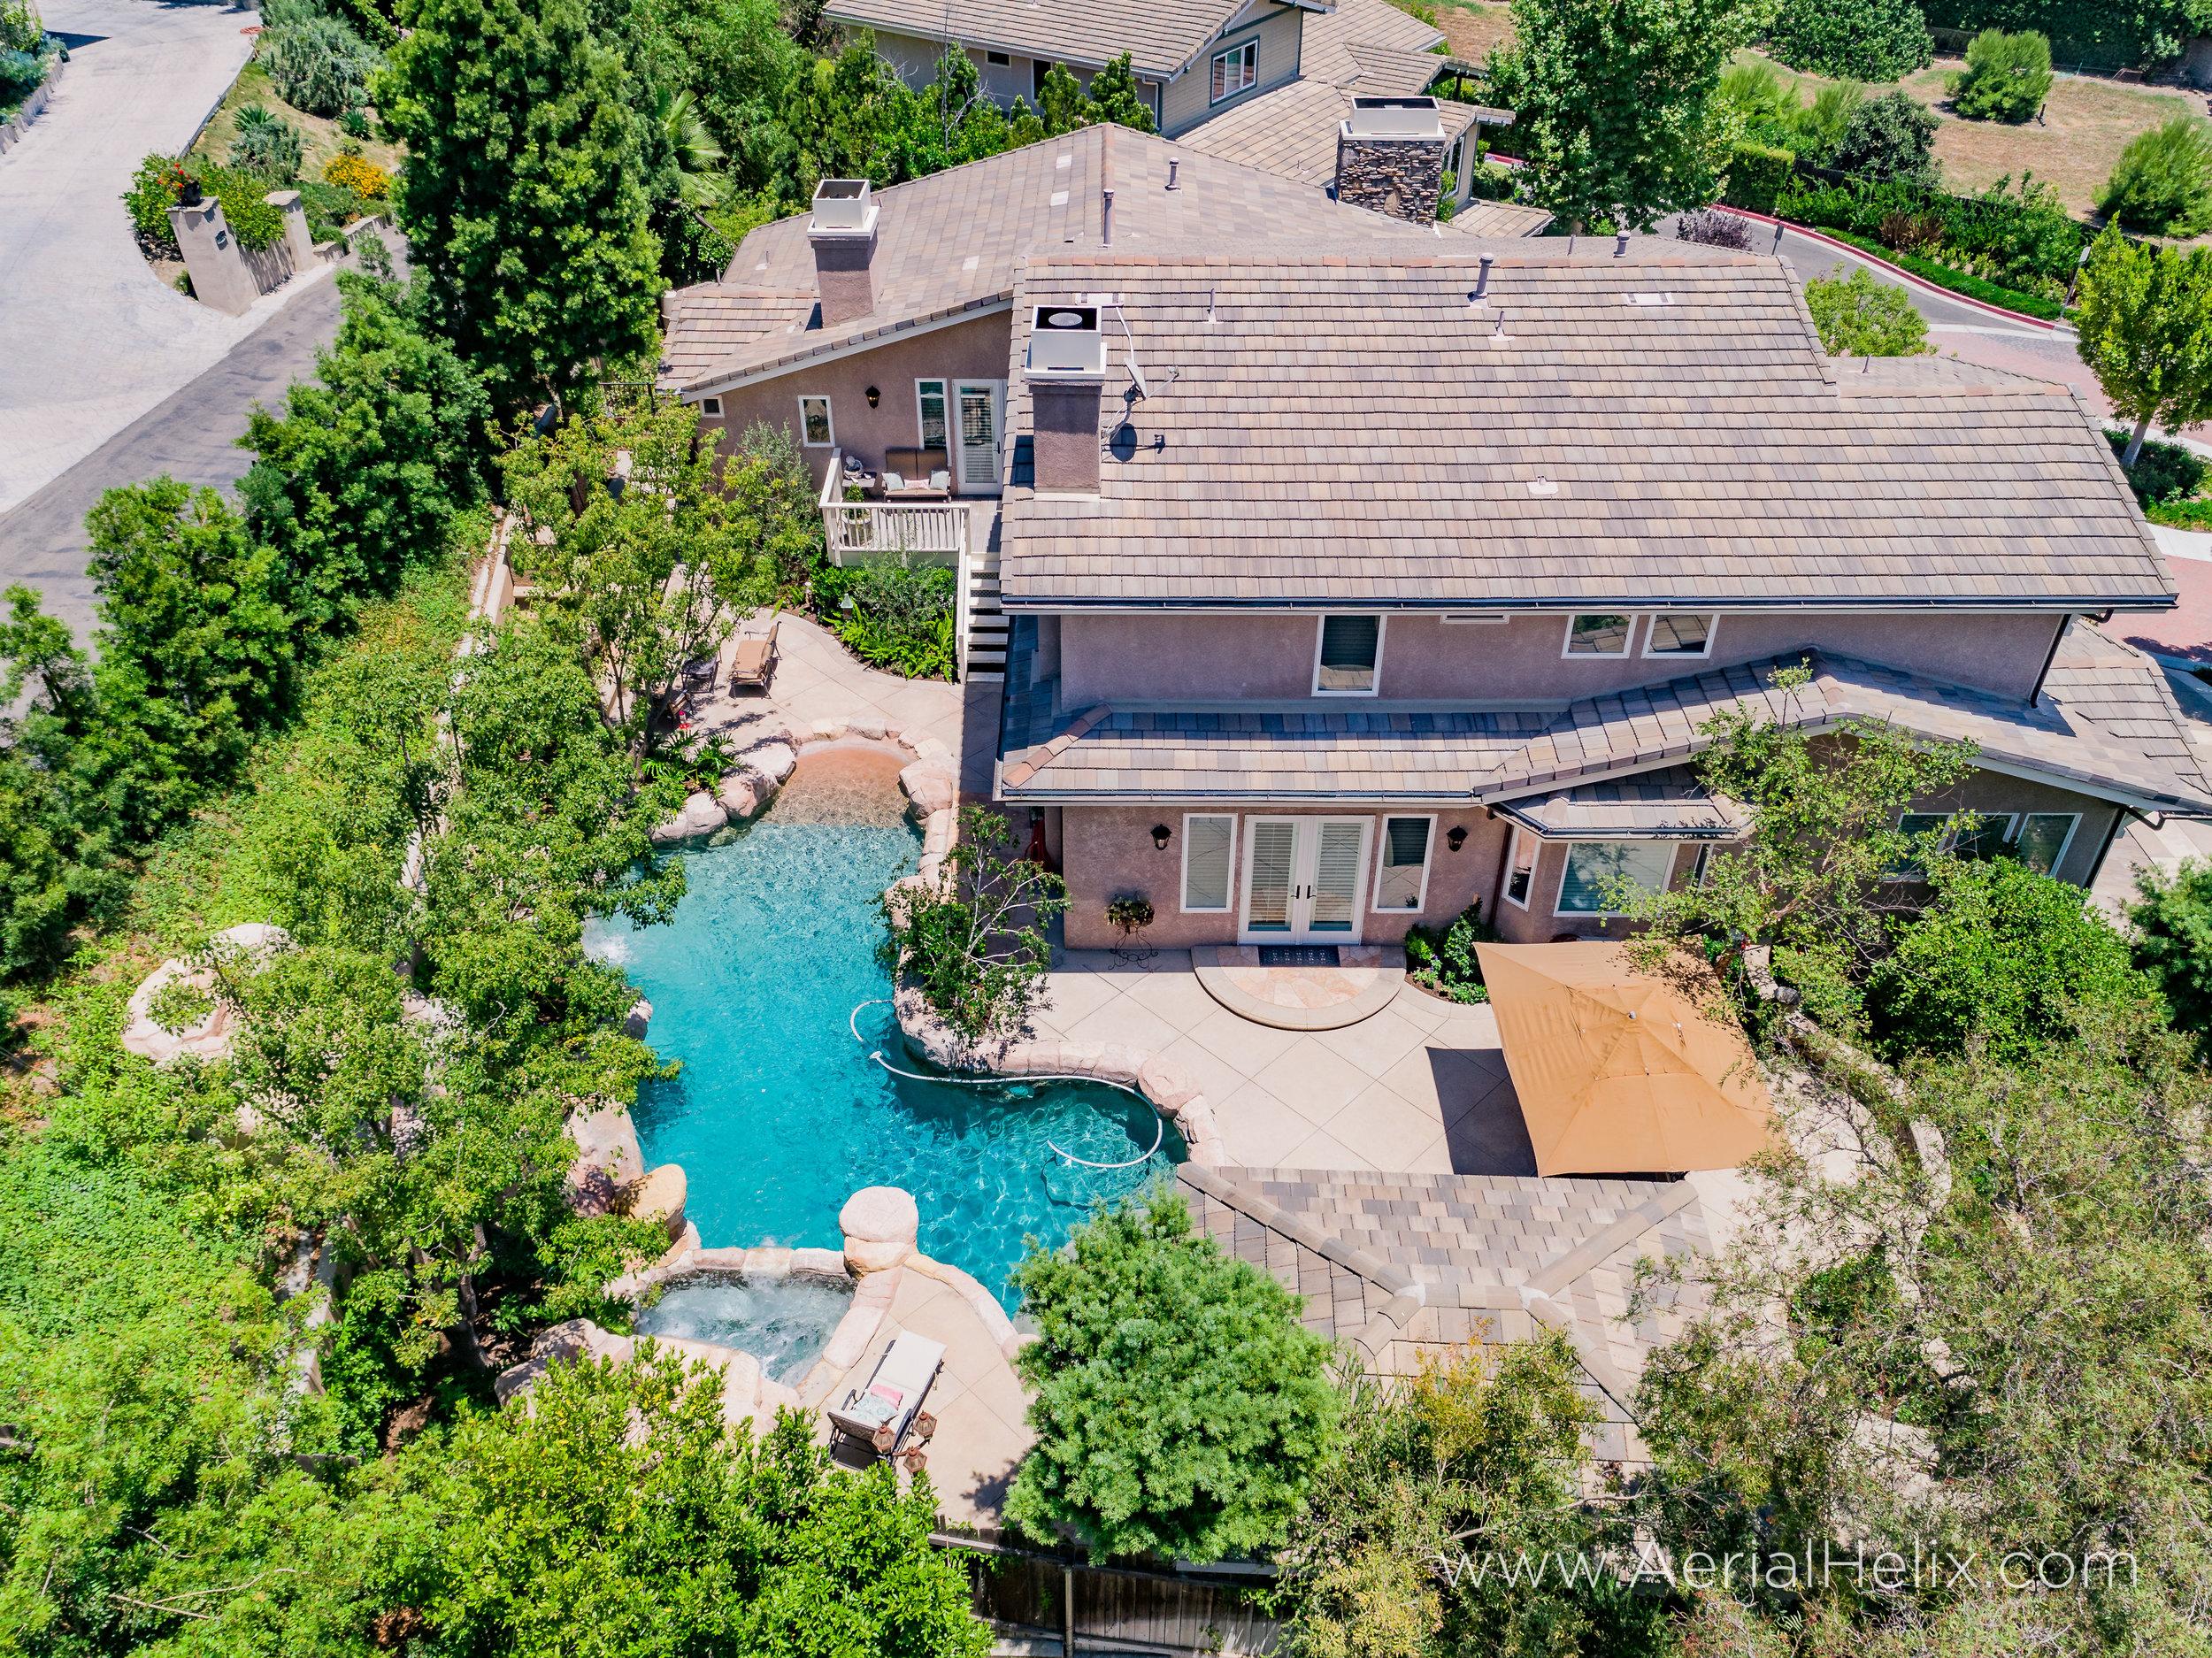 HELIX - Craftsman Lane - Real Estate Drone Photographer-16.jpg